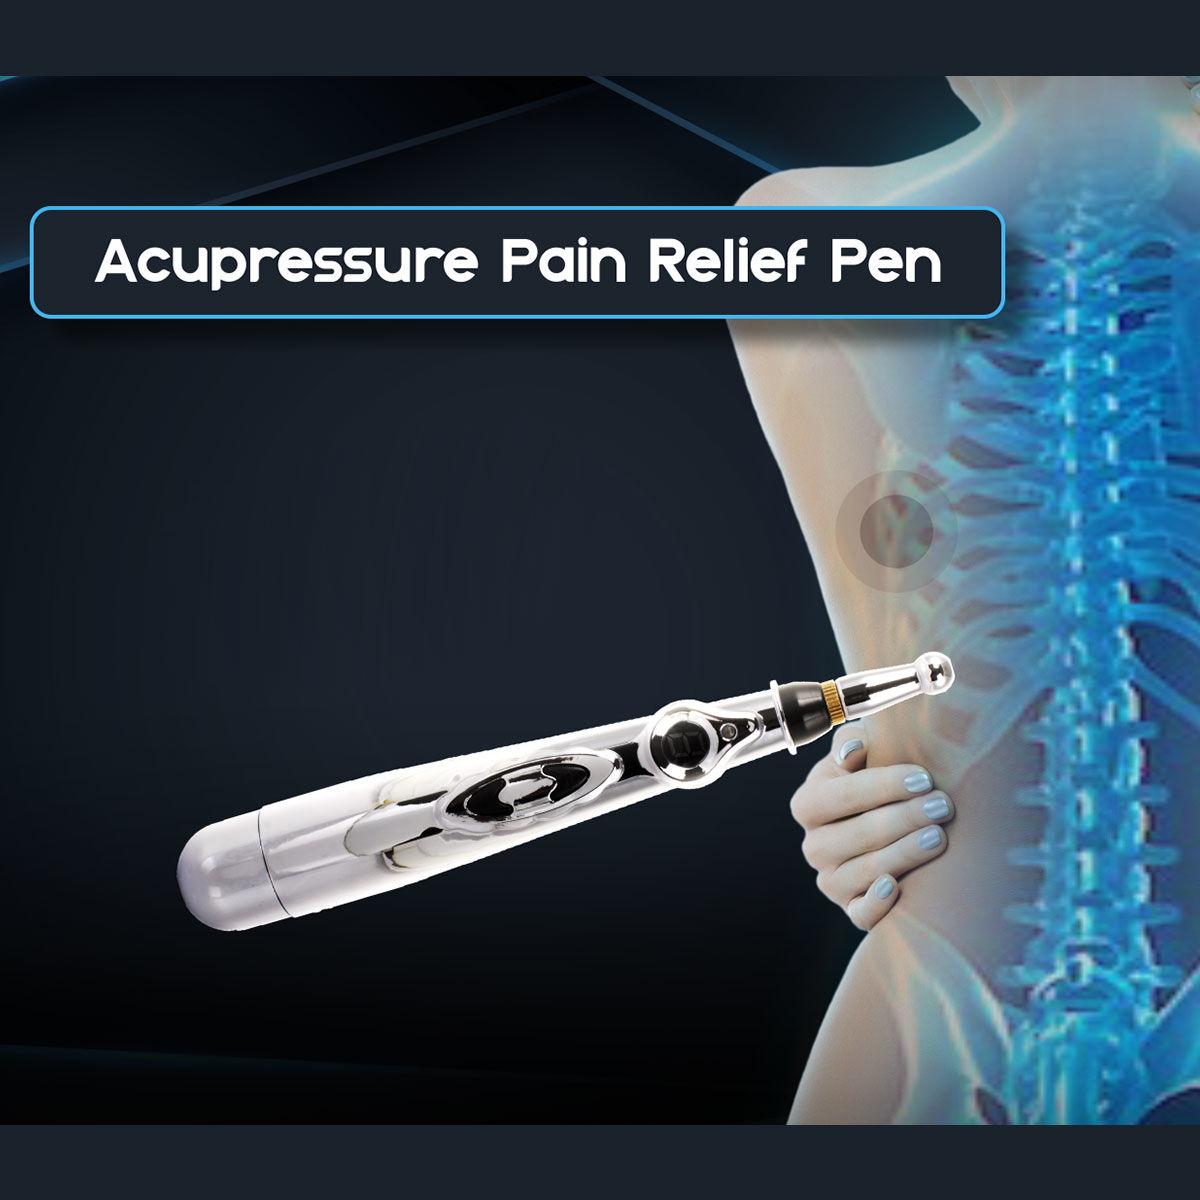 Buy Acupressure Pain Relief Pen Online at Best Price in ...